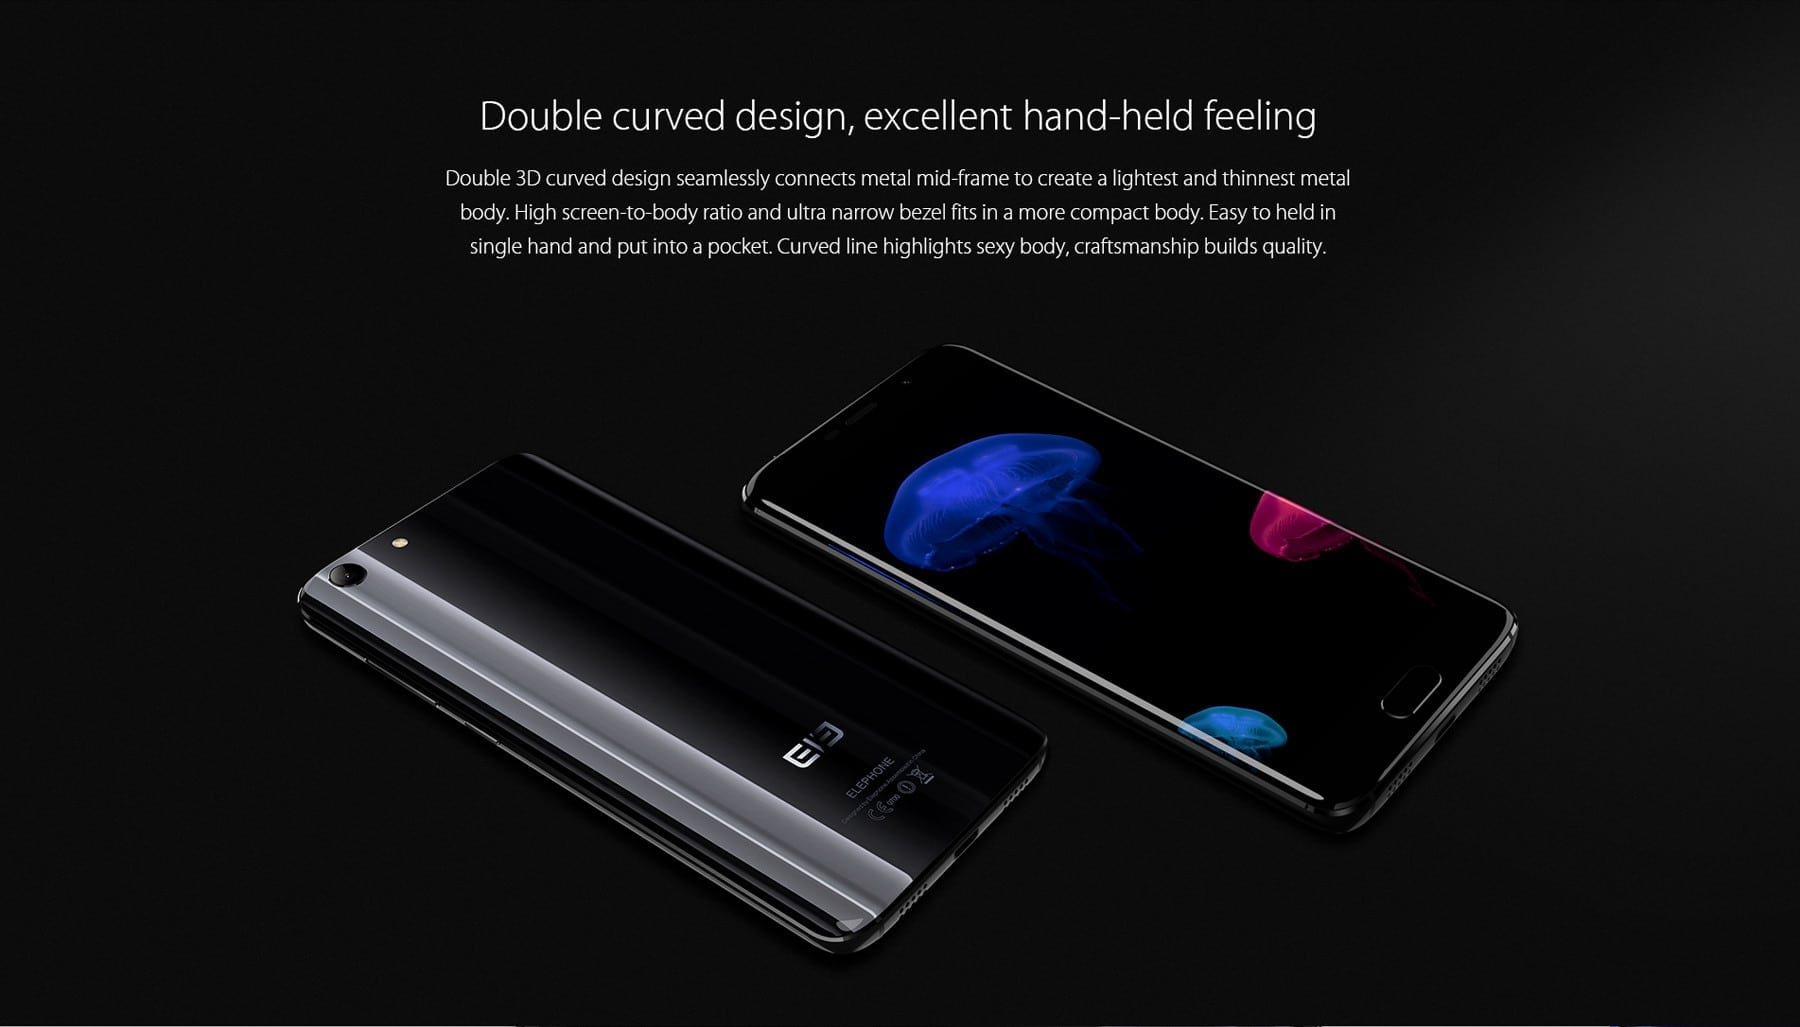 Elephone s7 design